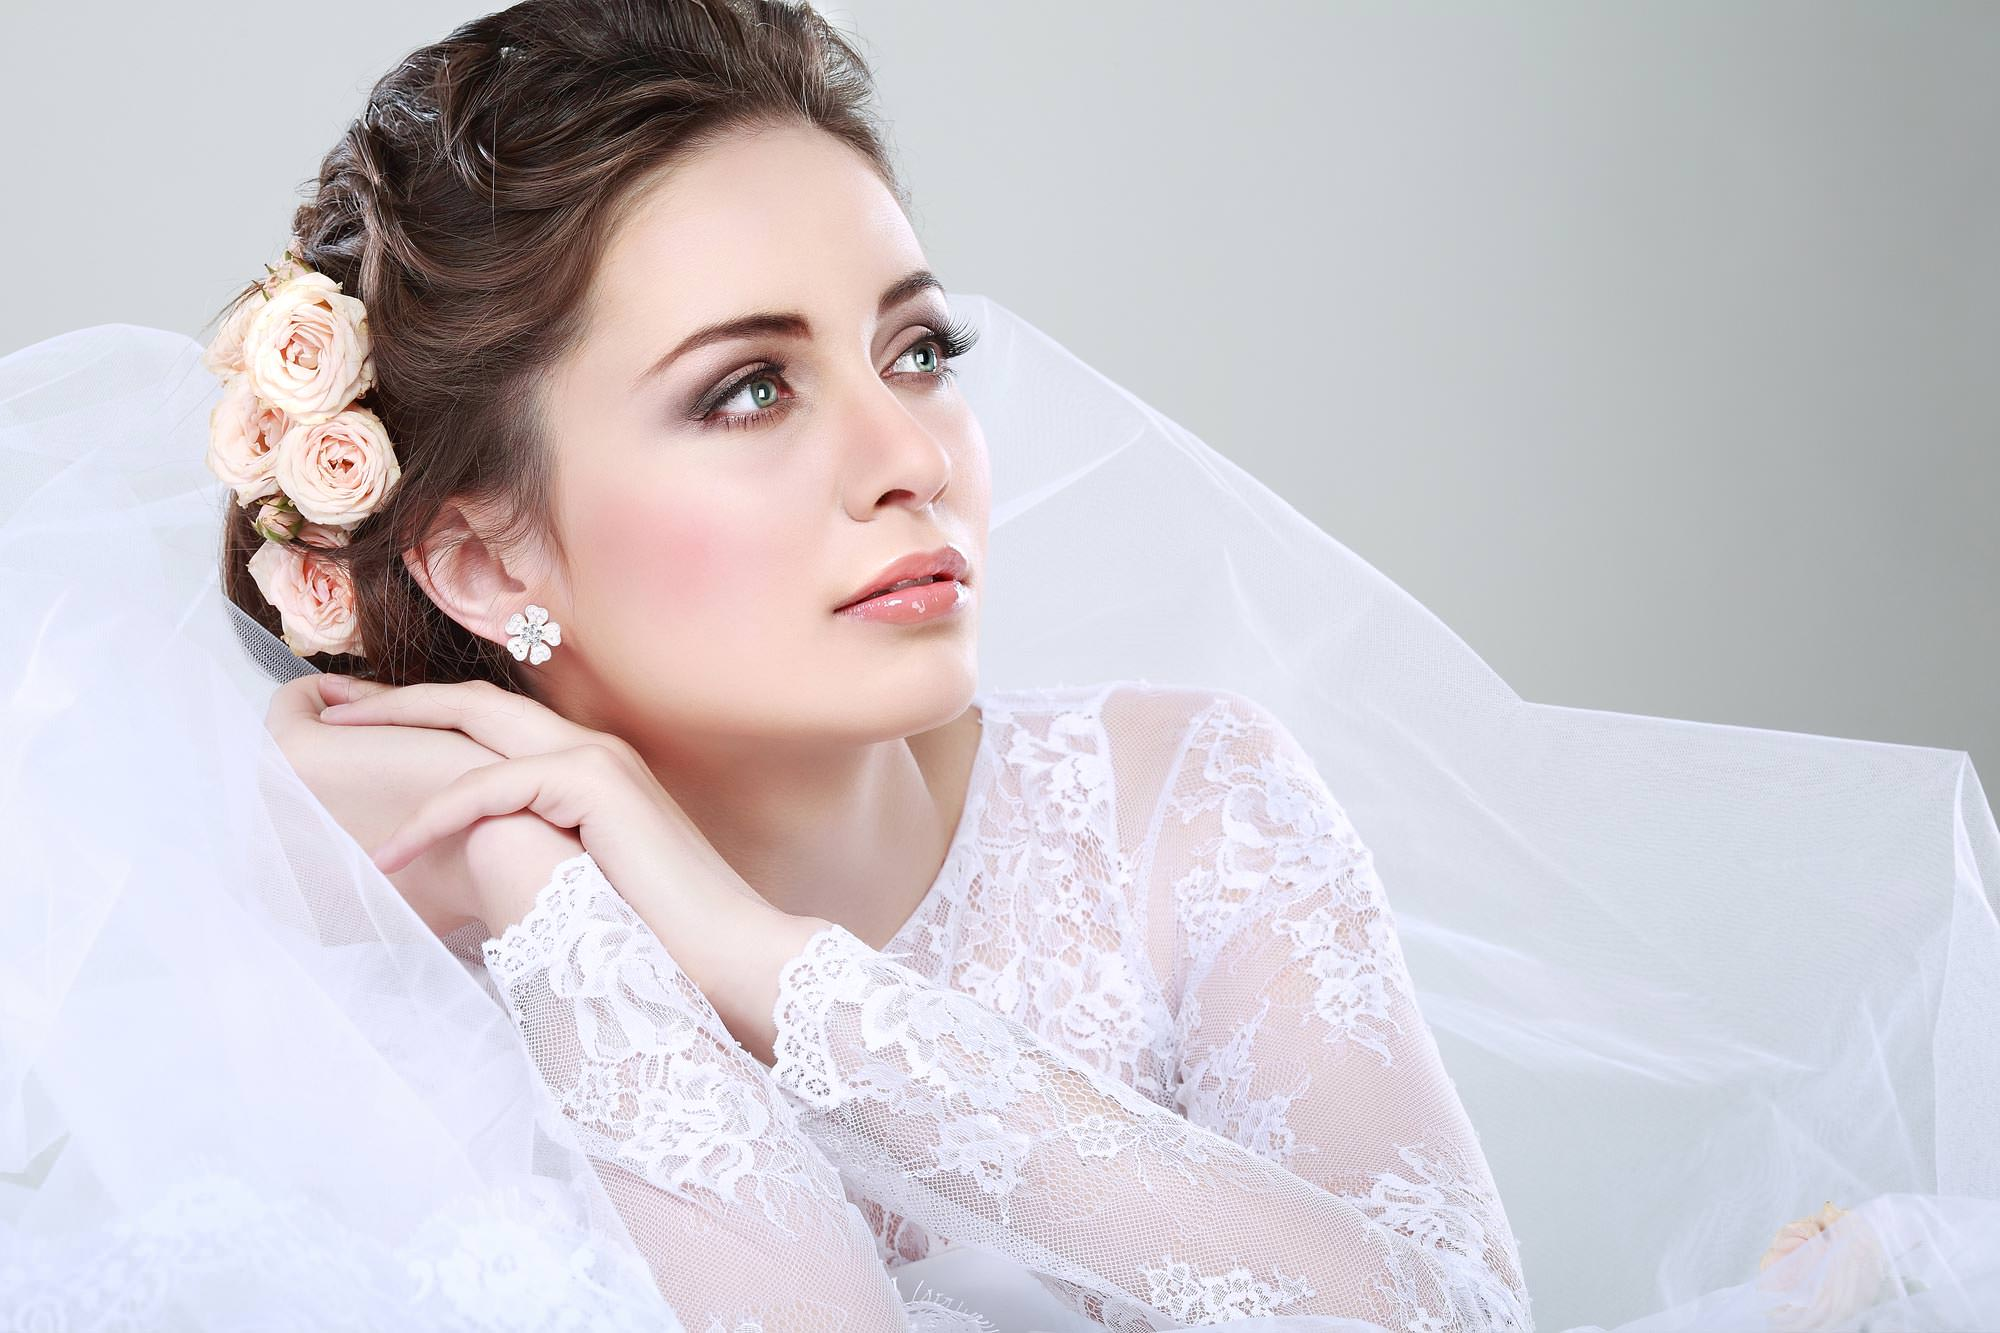 Robe mariage juif  La mode des robes de France